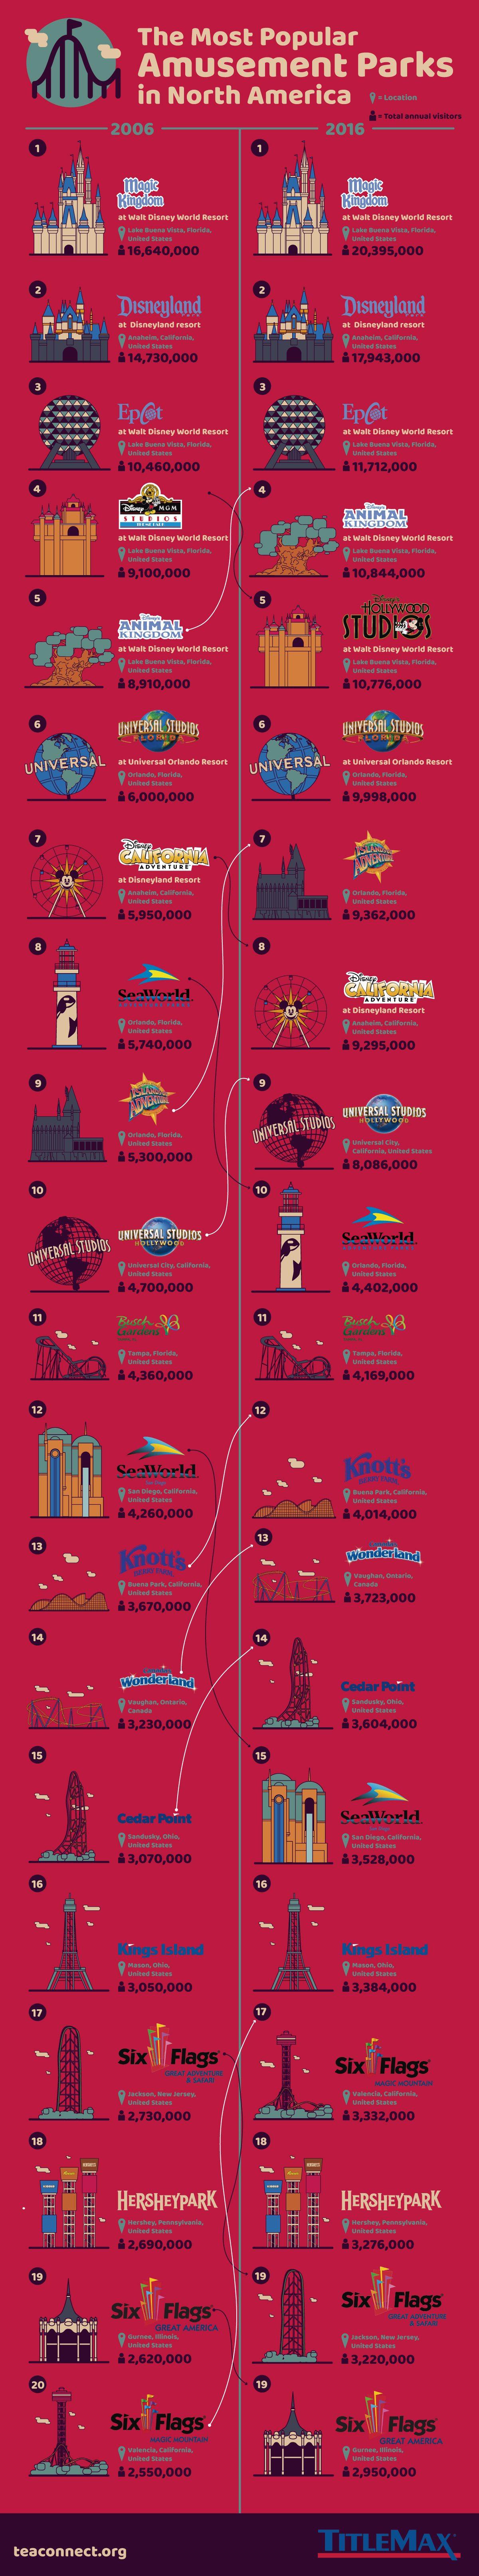 Most Popular Amusement Parks in America